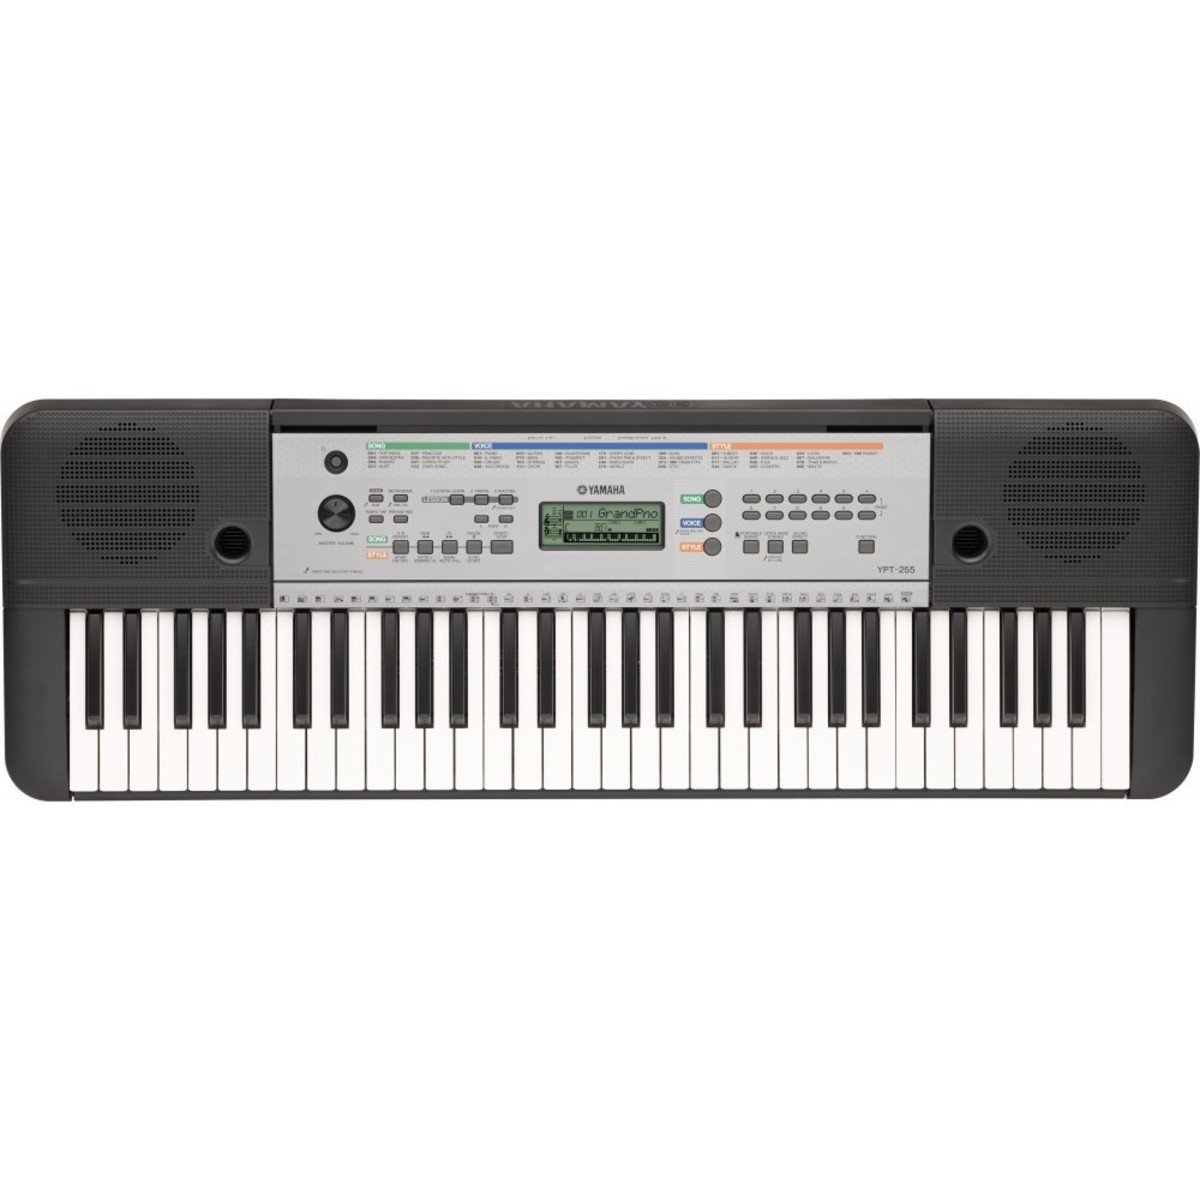 yamaha ypt 255 61 key portable keyboard at. Black Bedroom Furniture Sets. Home Design Ideas